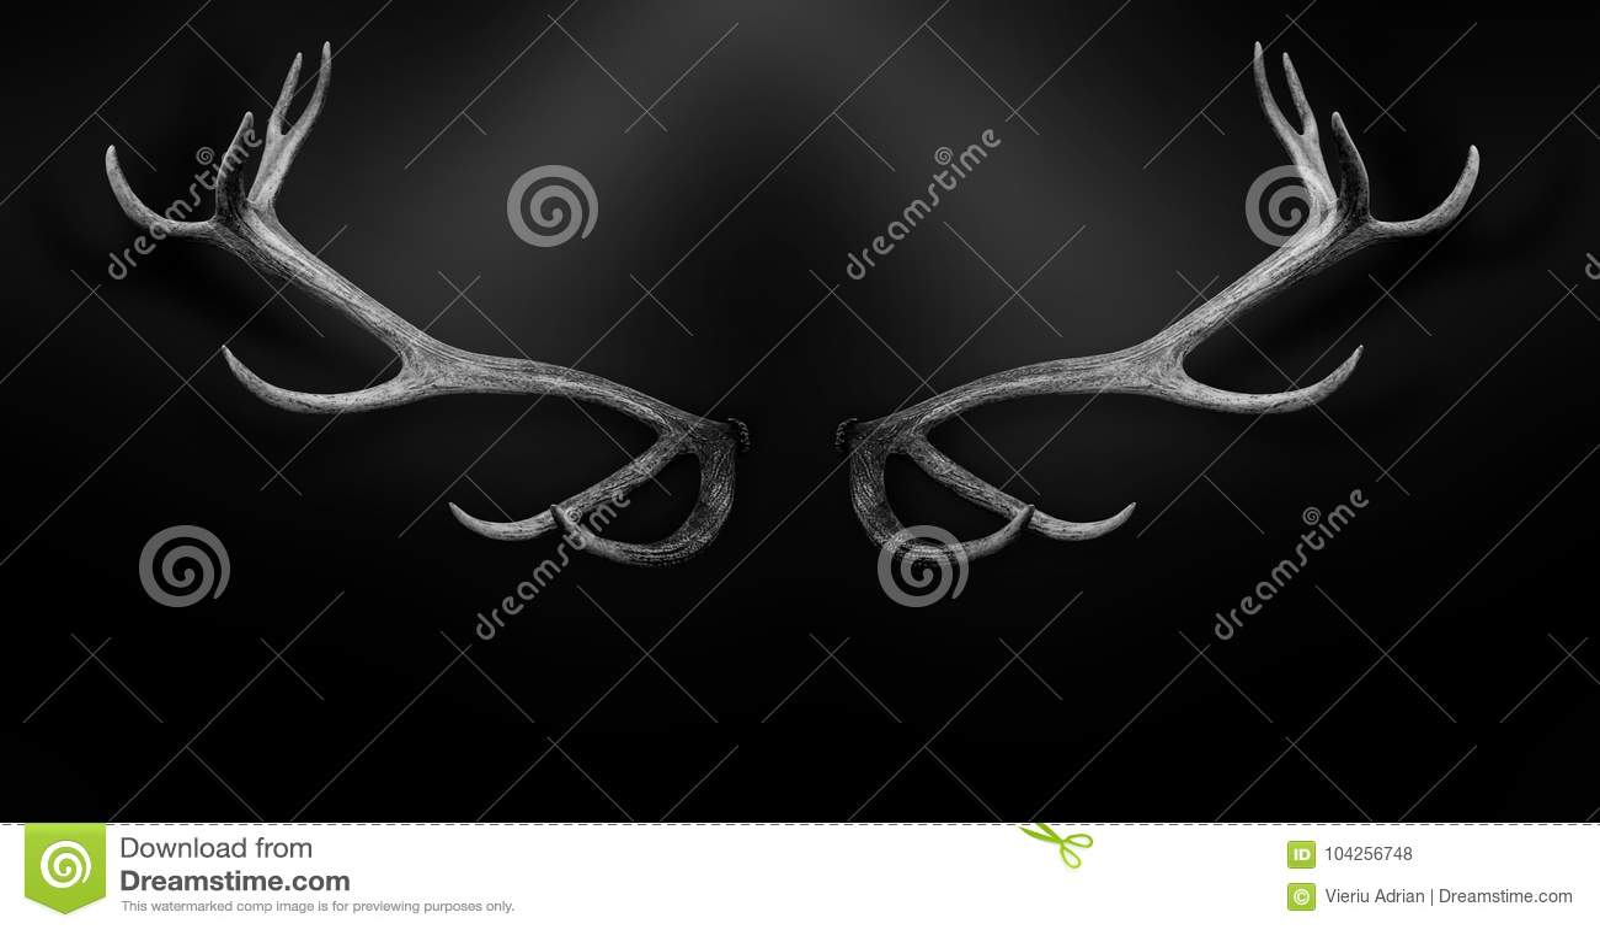 Van hertengeweitakken 3d geïsoleerd zwart wit dier als achtergrond